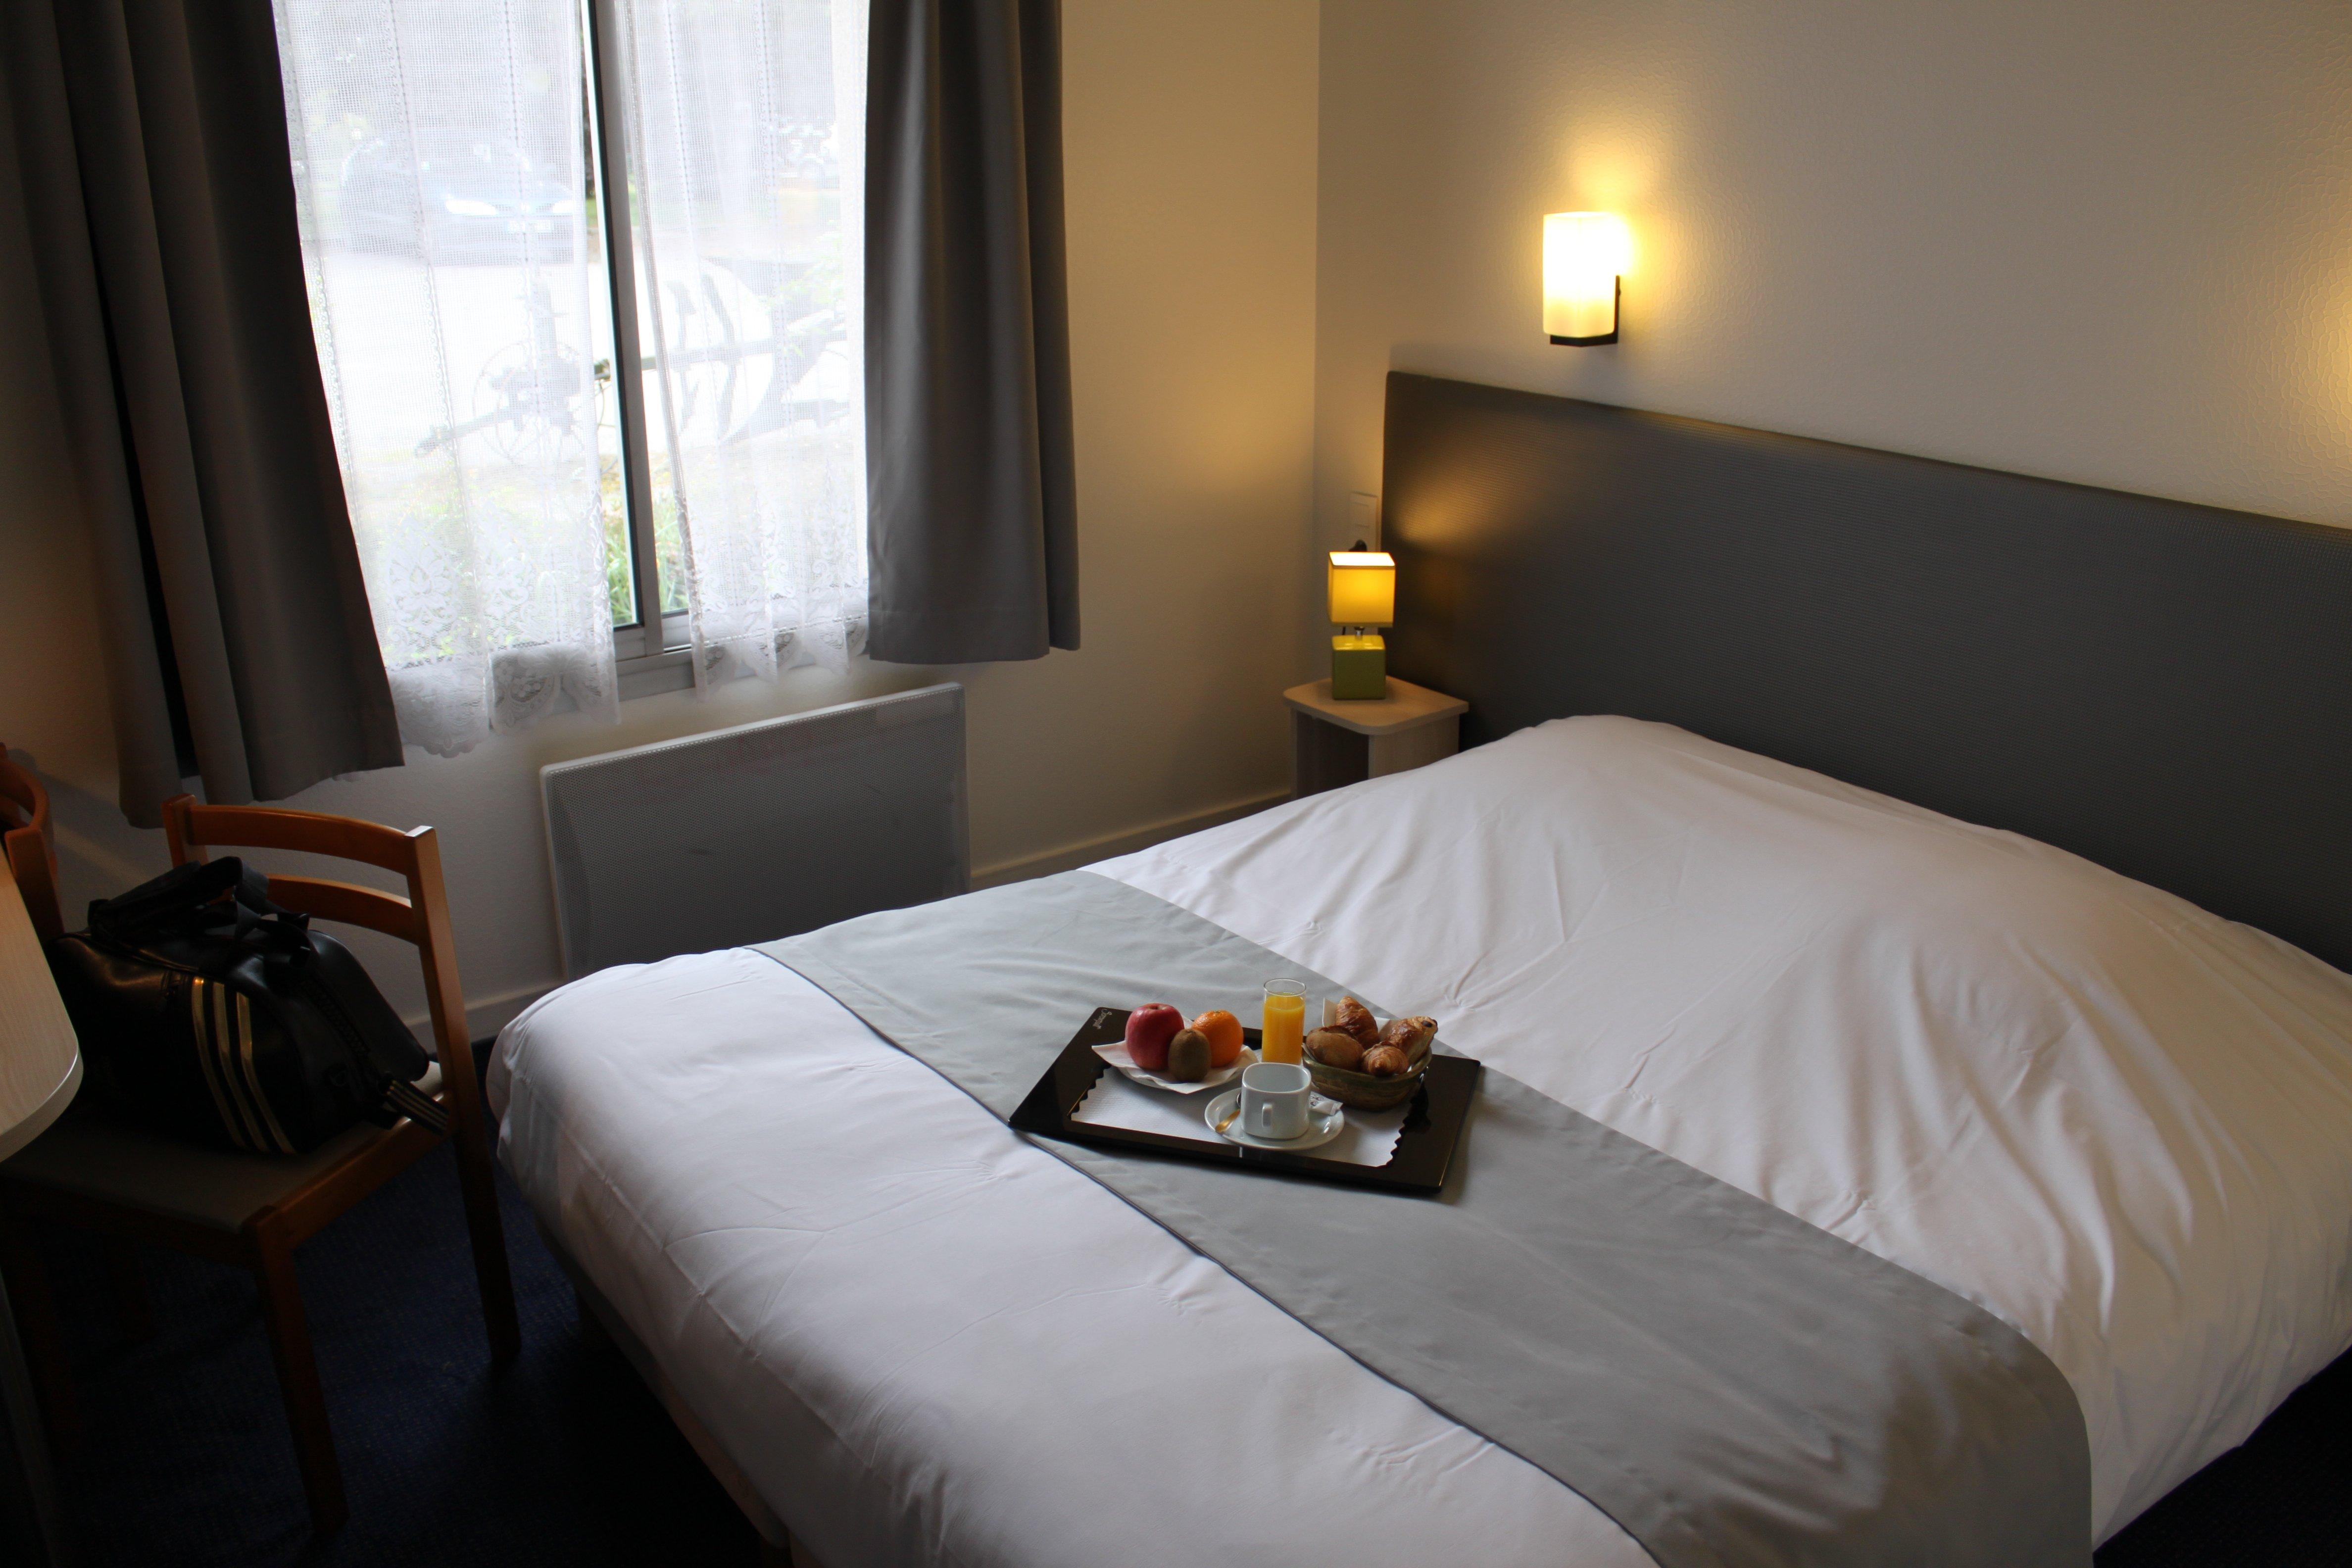 Hotel Lodge La Valette